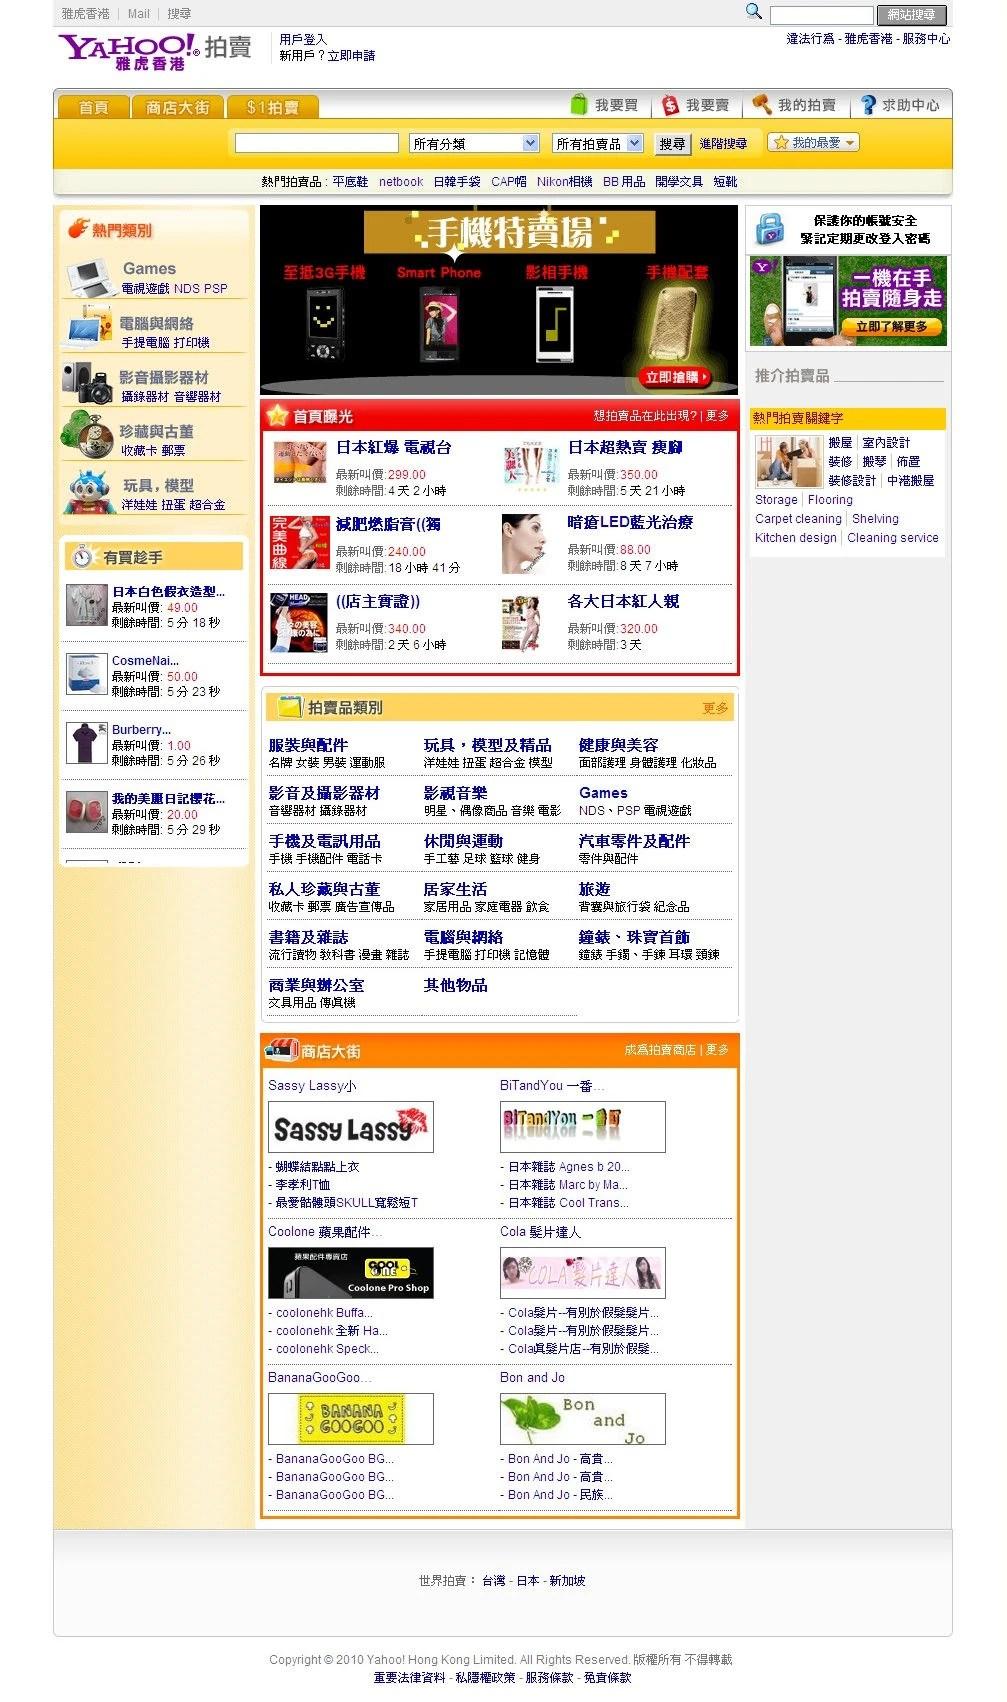 Yahoo!拍賣 | 香港網絡大典 | FANDOM powered by Wikia